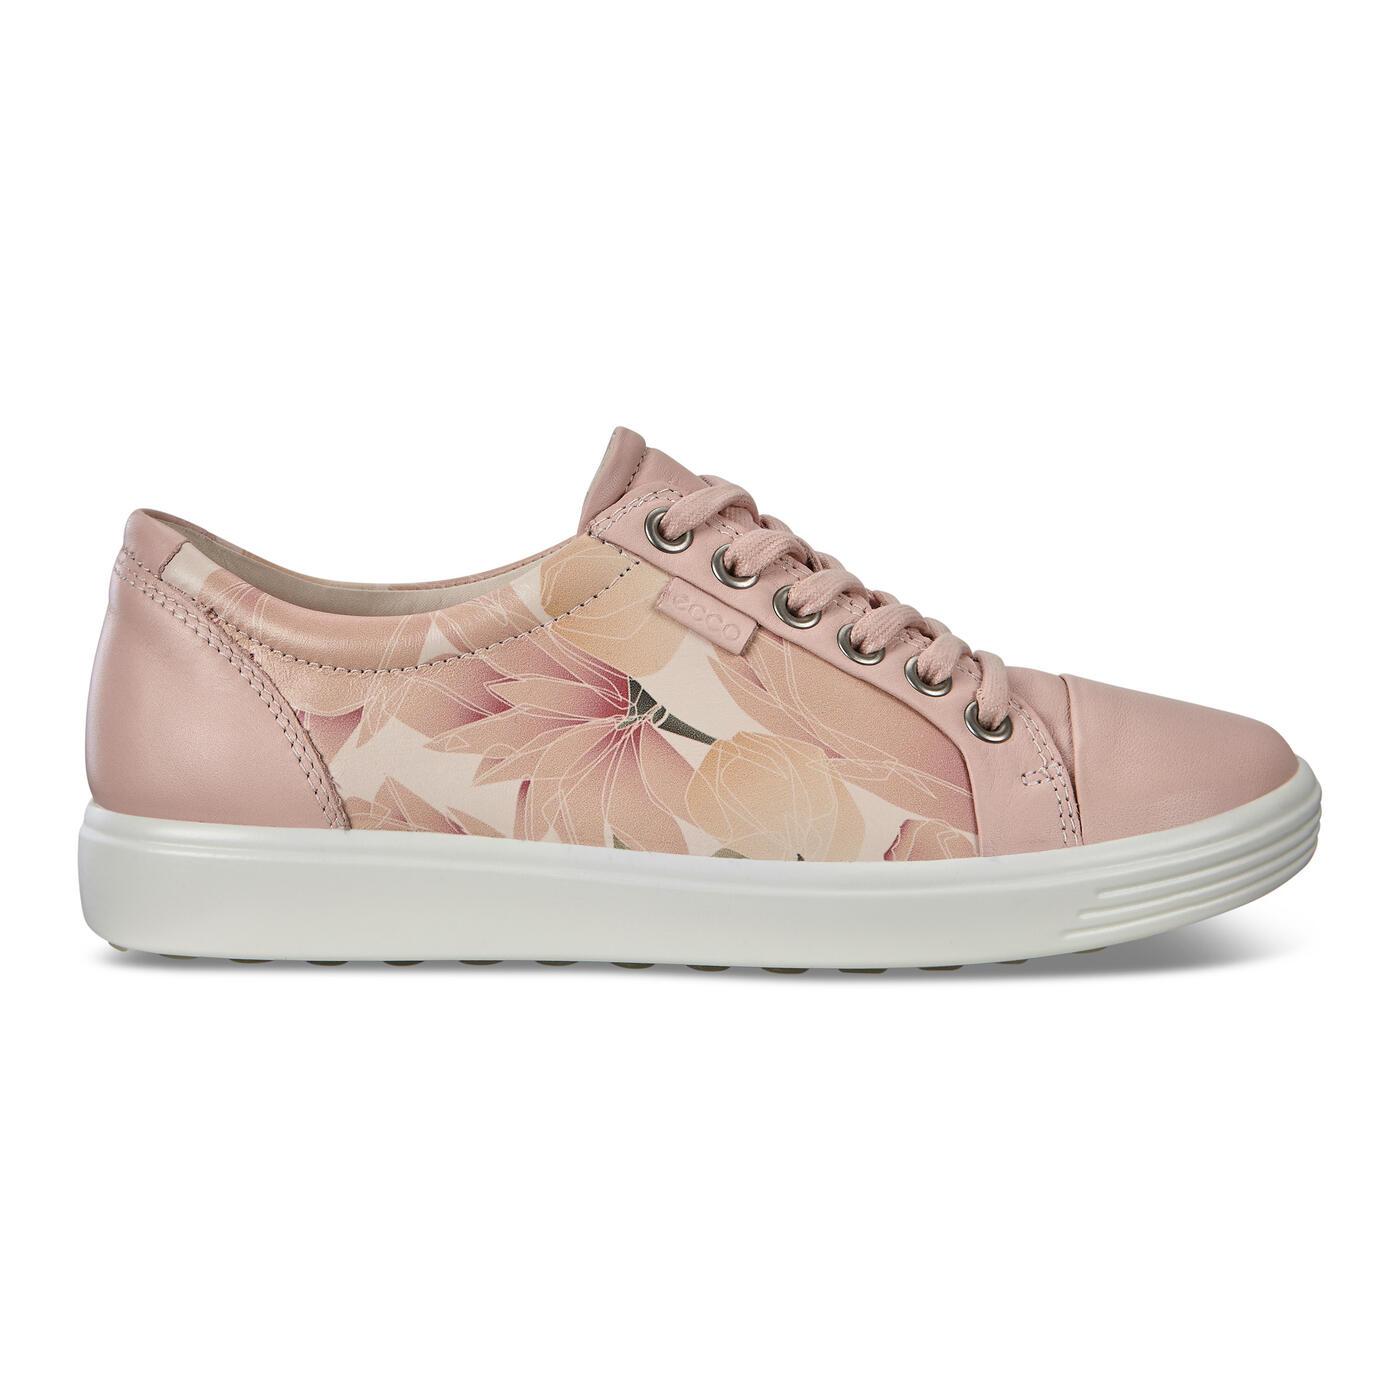 ECCO Women's Soft 7 Sneakers